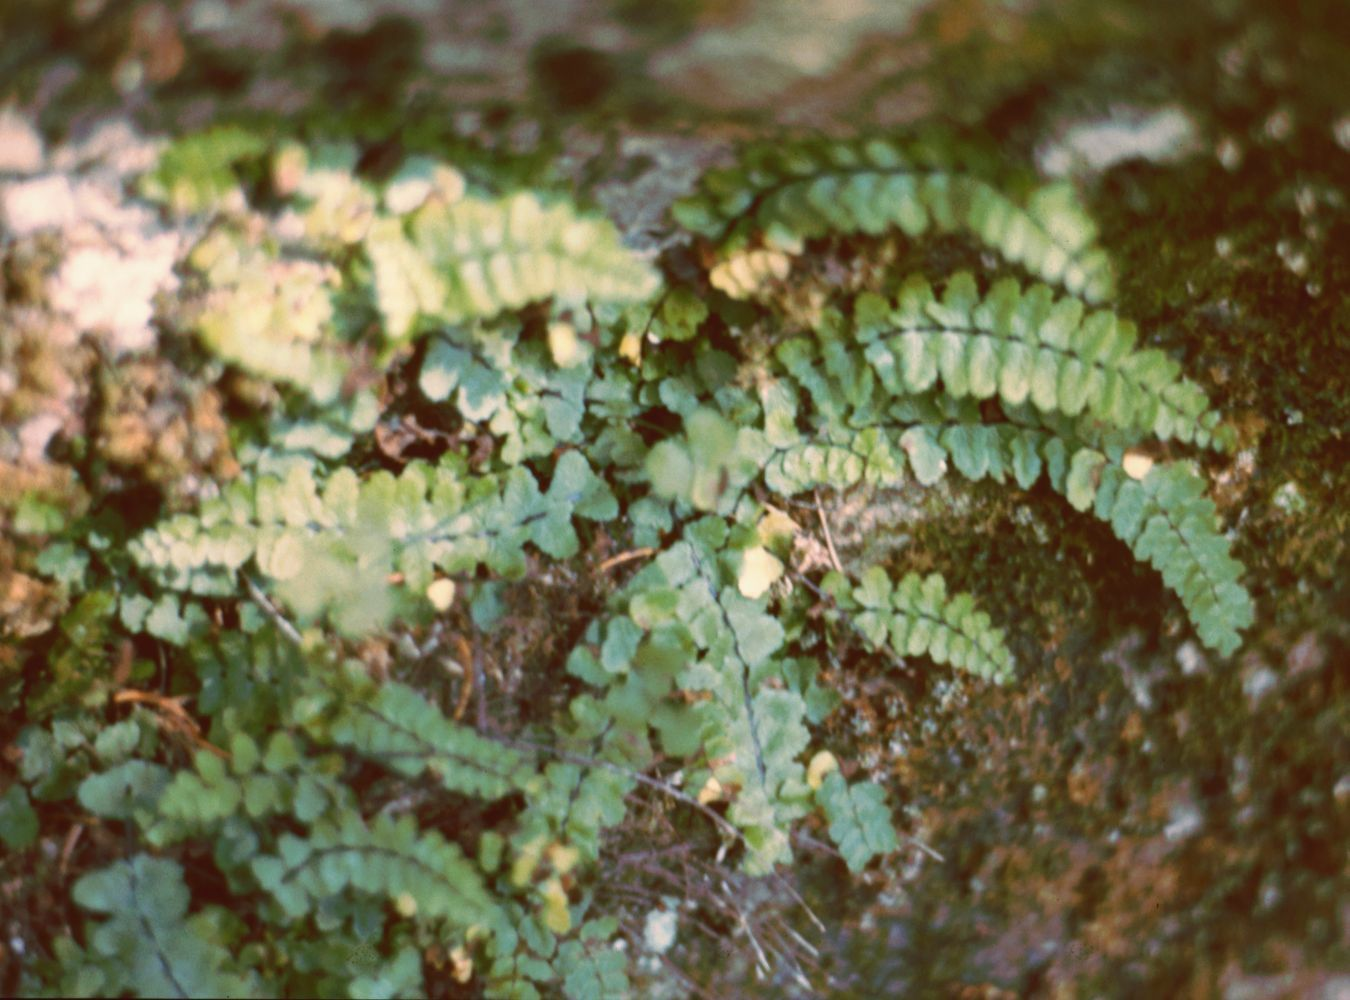 Asplenium Trichomanes Wikipedia File:asplenium-trichomanes